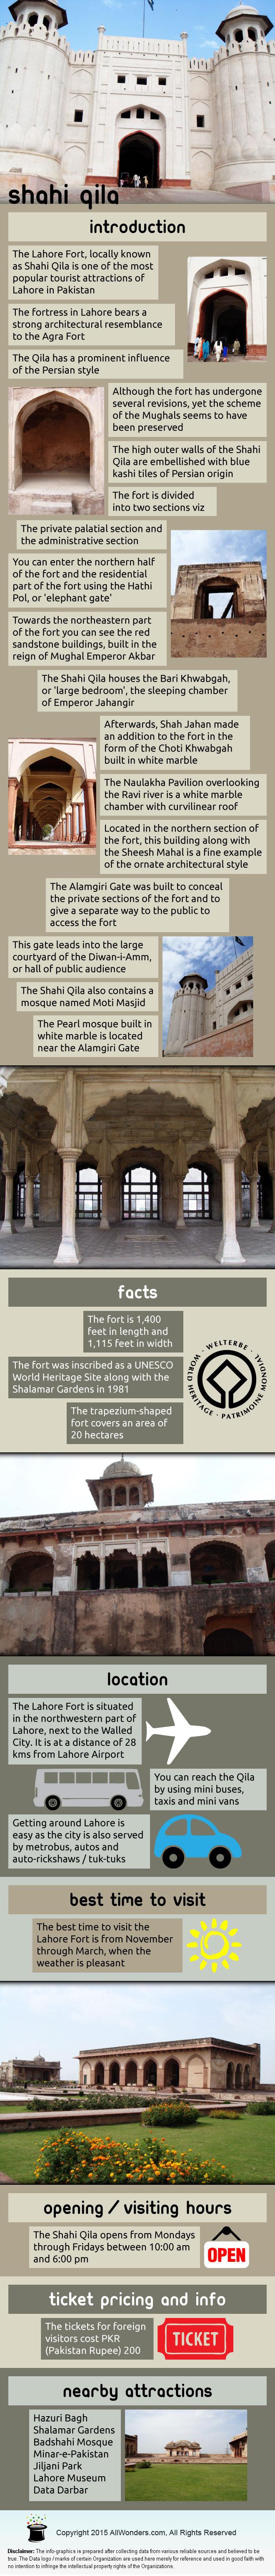 Shahi Qila Infographic